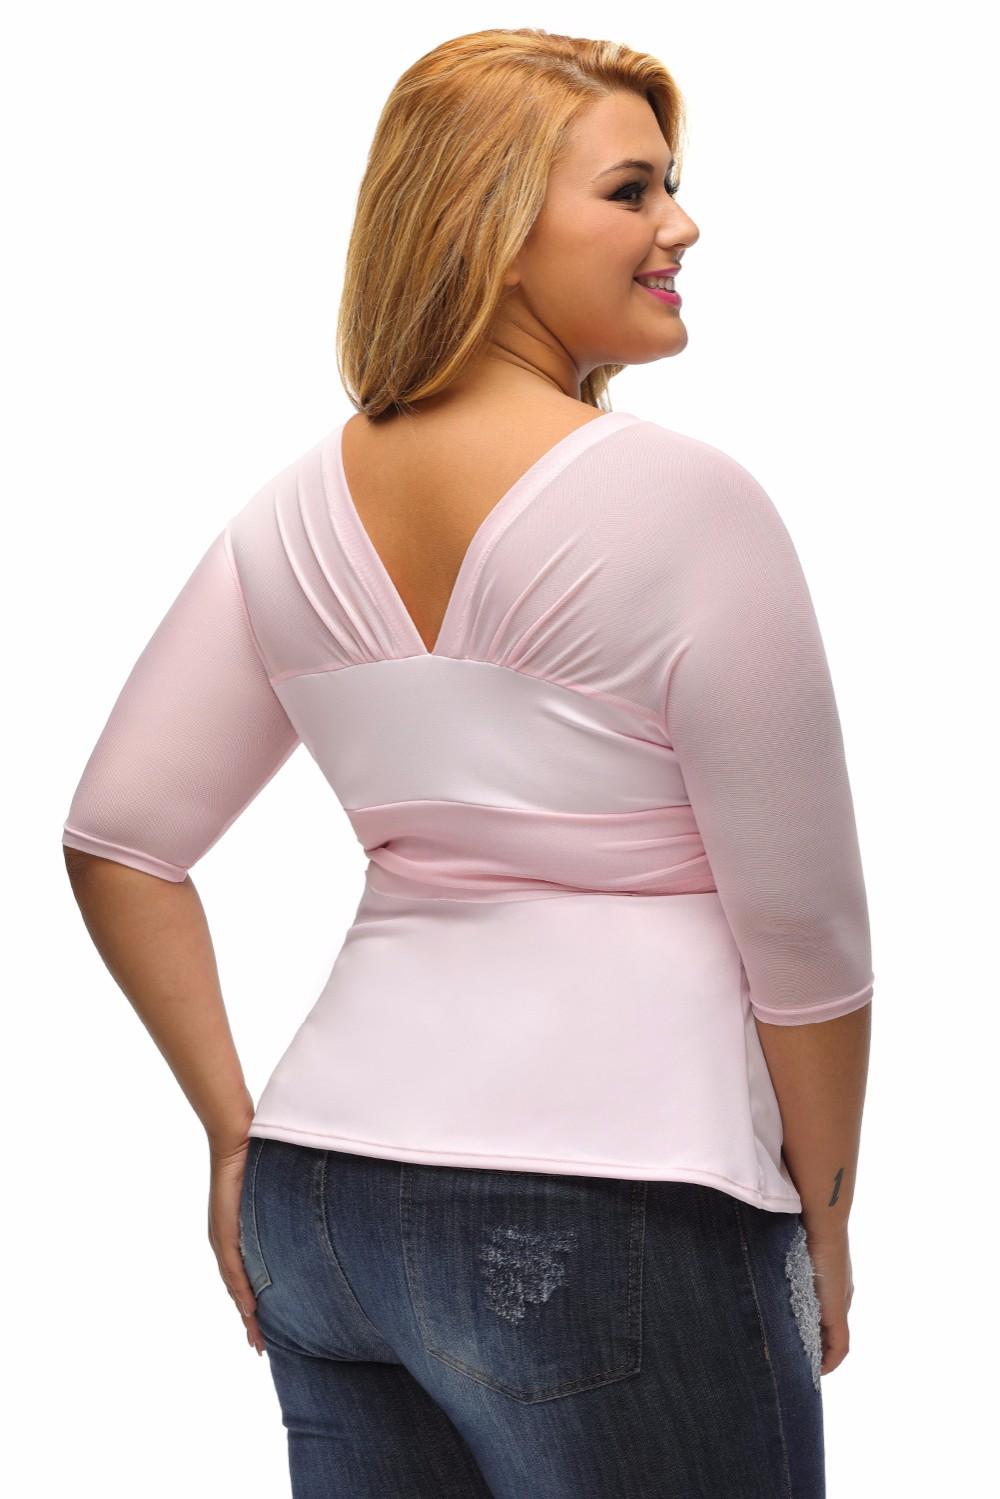 Pink-Pretty-Peplum-Mesh-Plus-Size-Top-LC25958-10-5